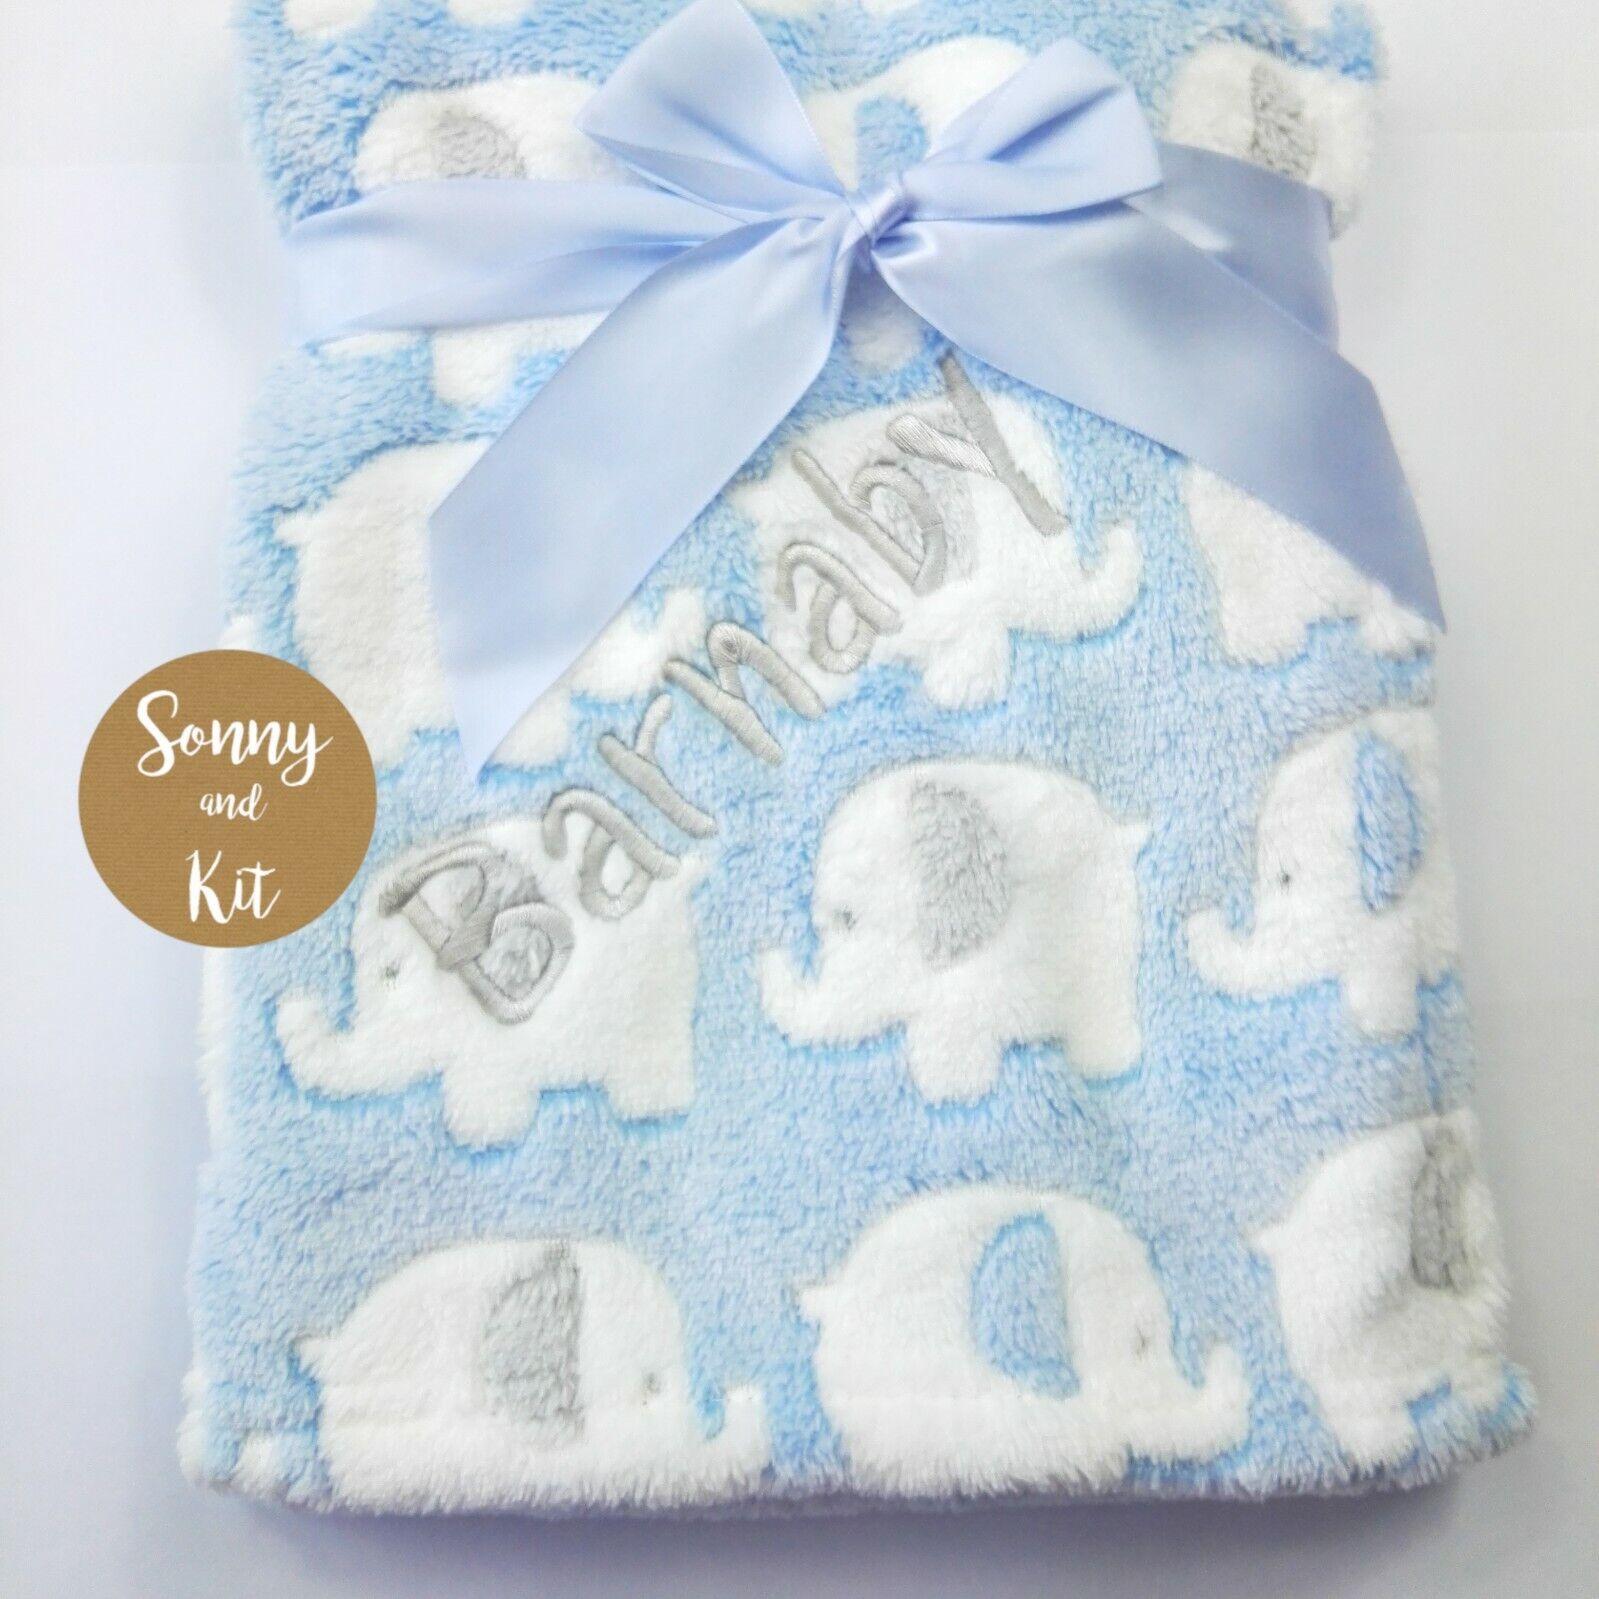 Personalised elephant baby blanket customised cute animal design throw